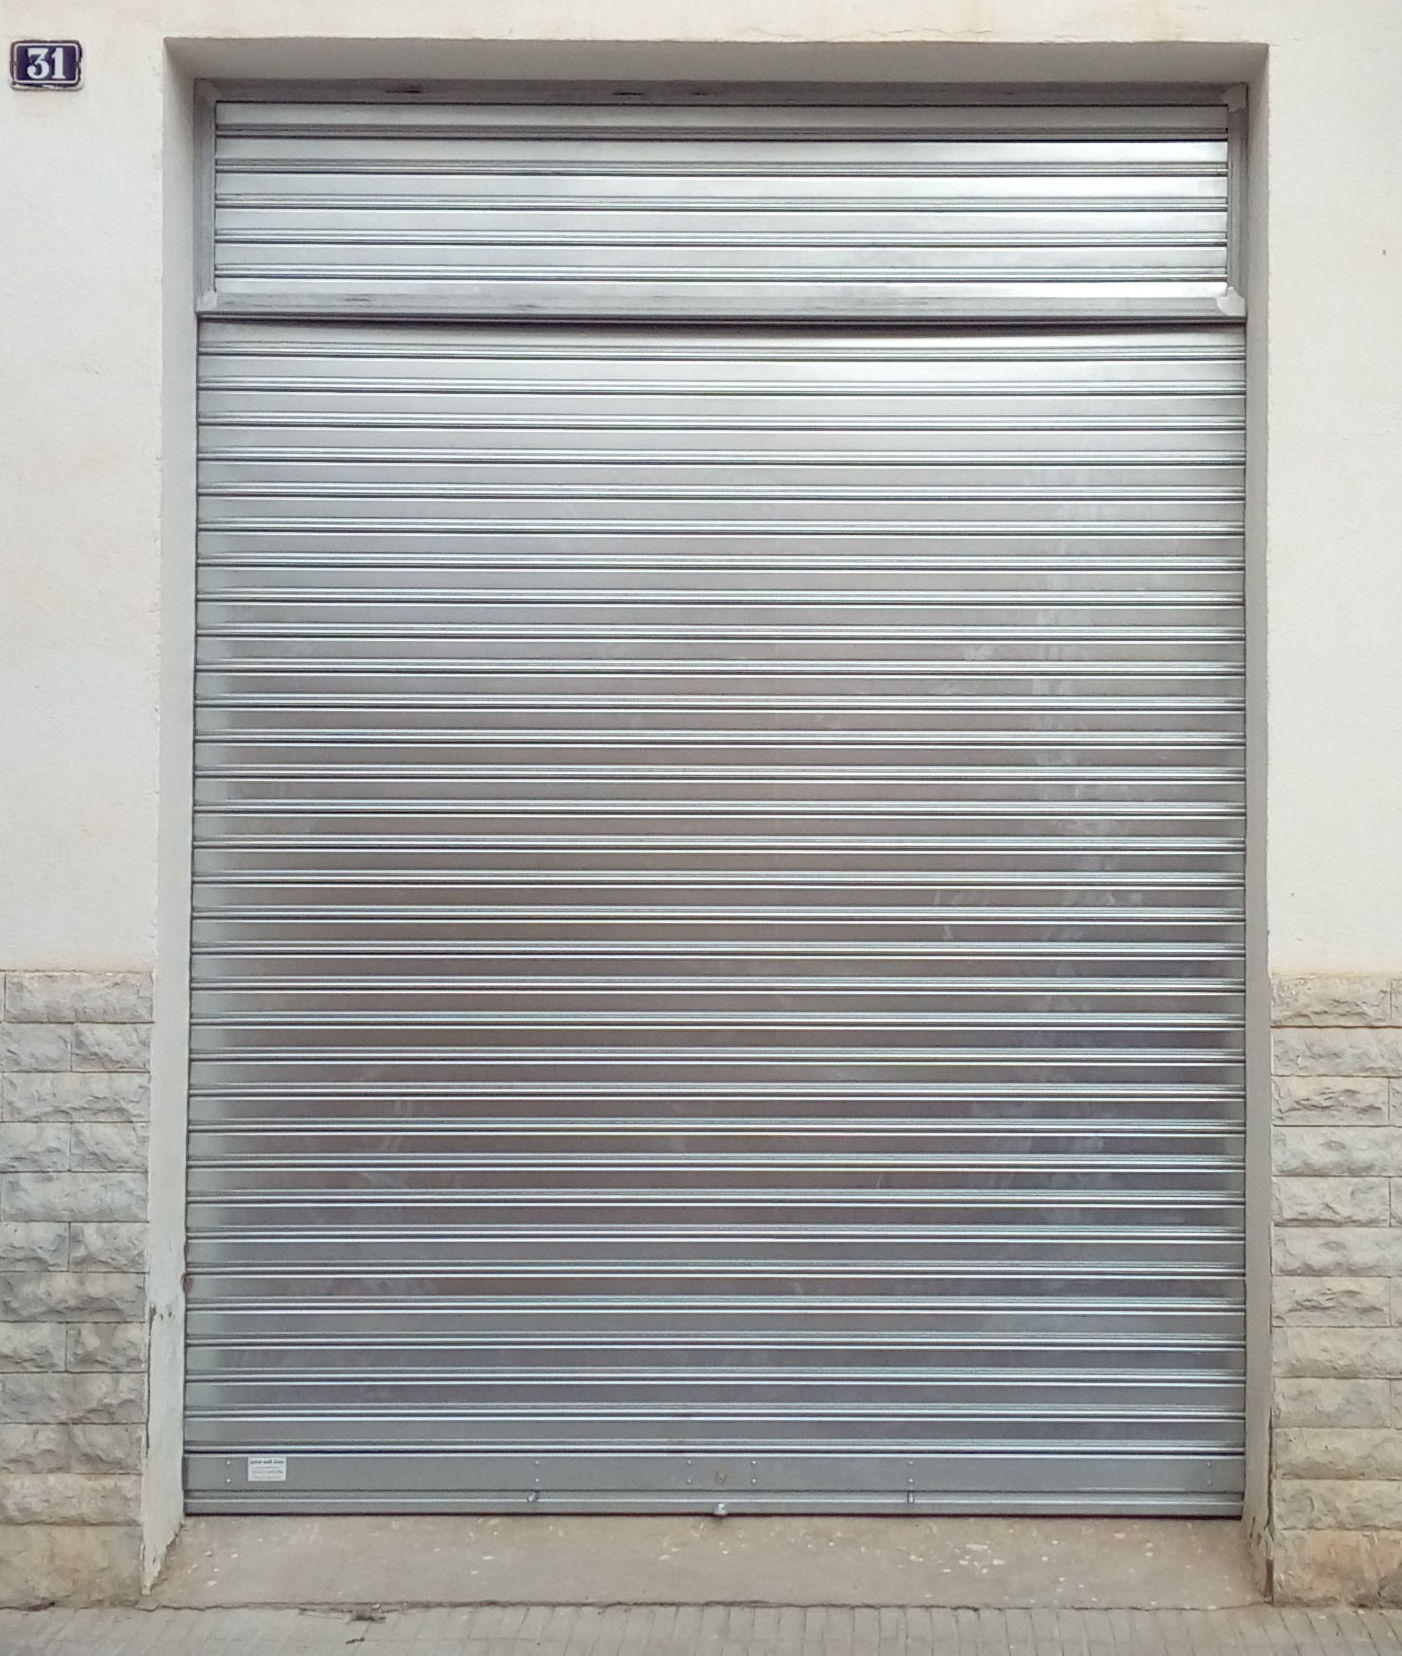 puerta enrollable con fijo superior